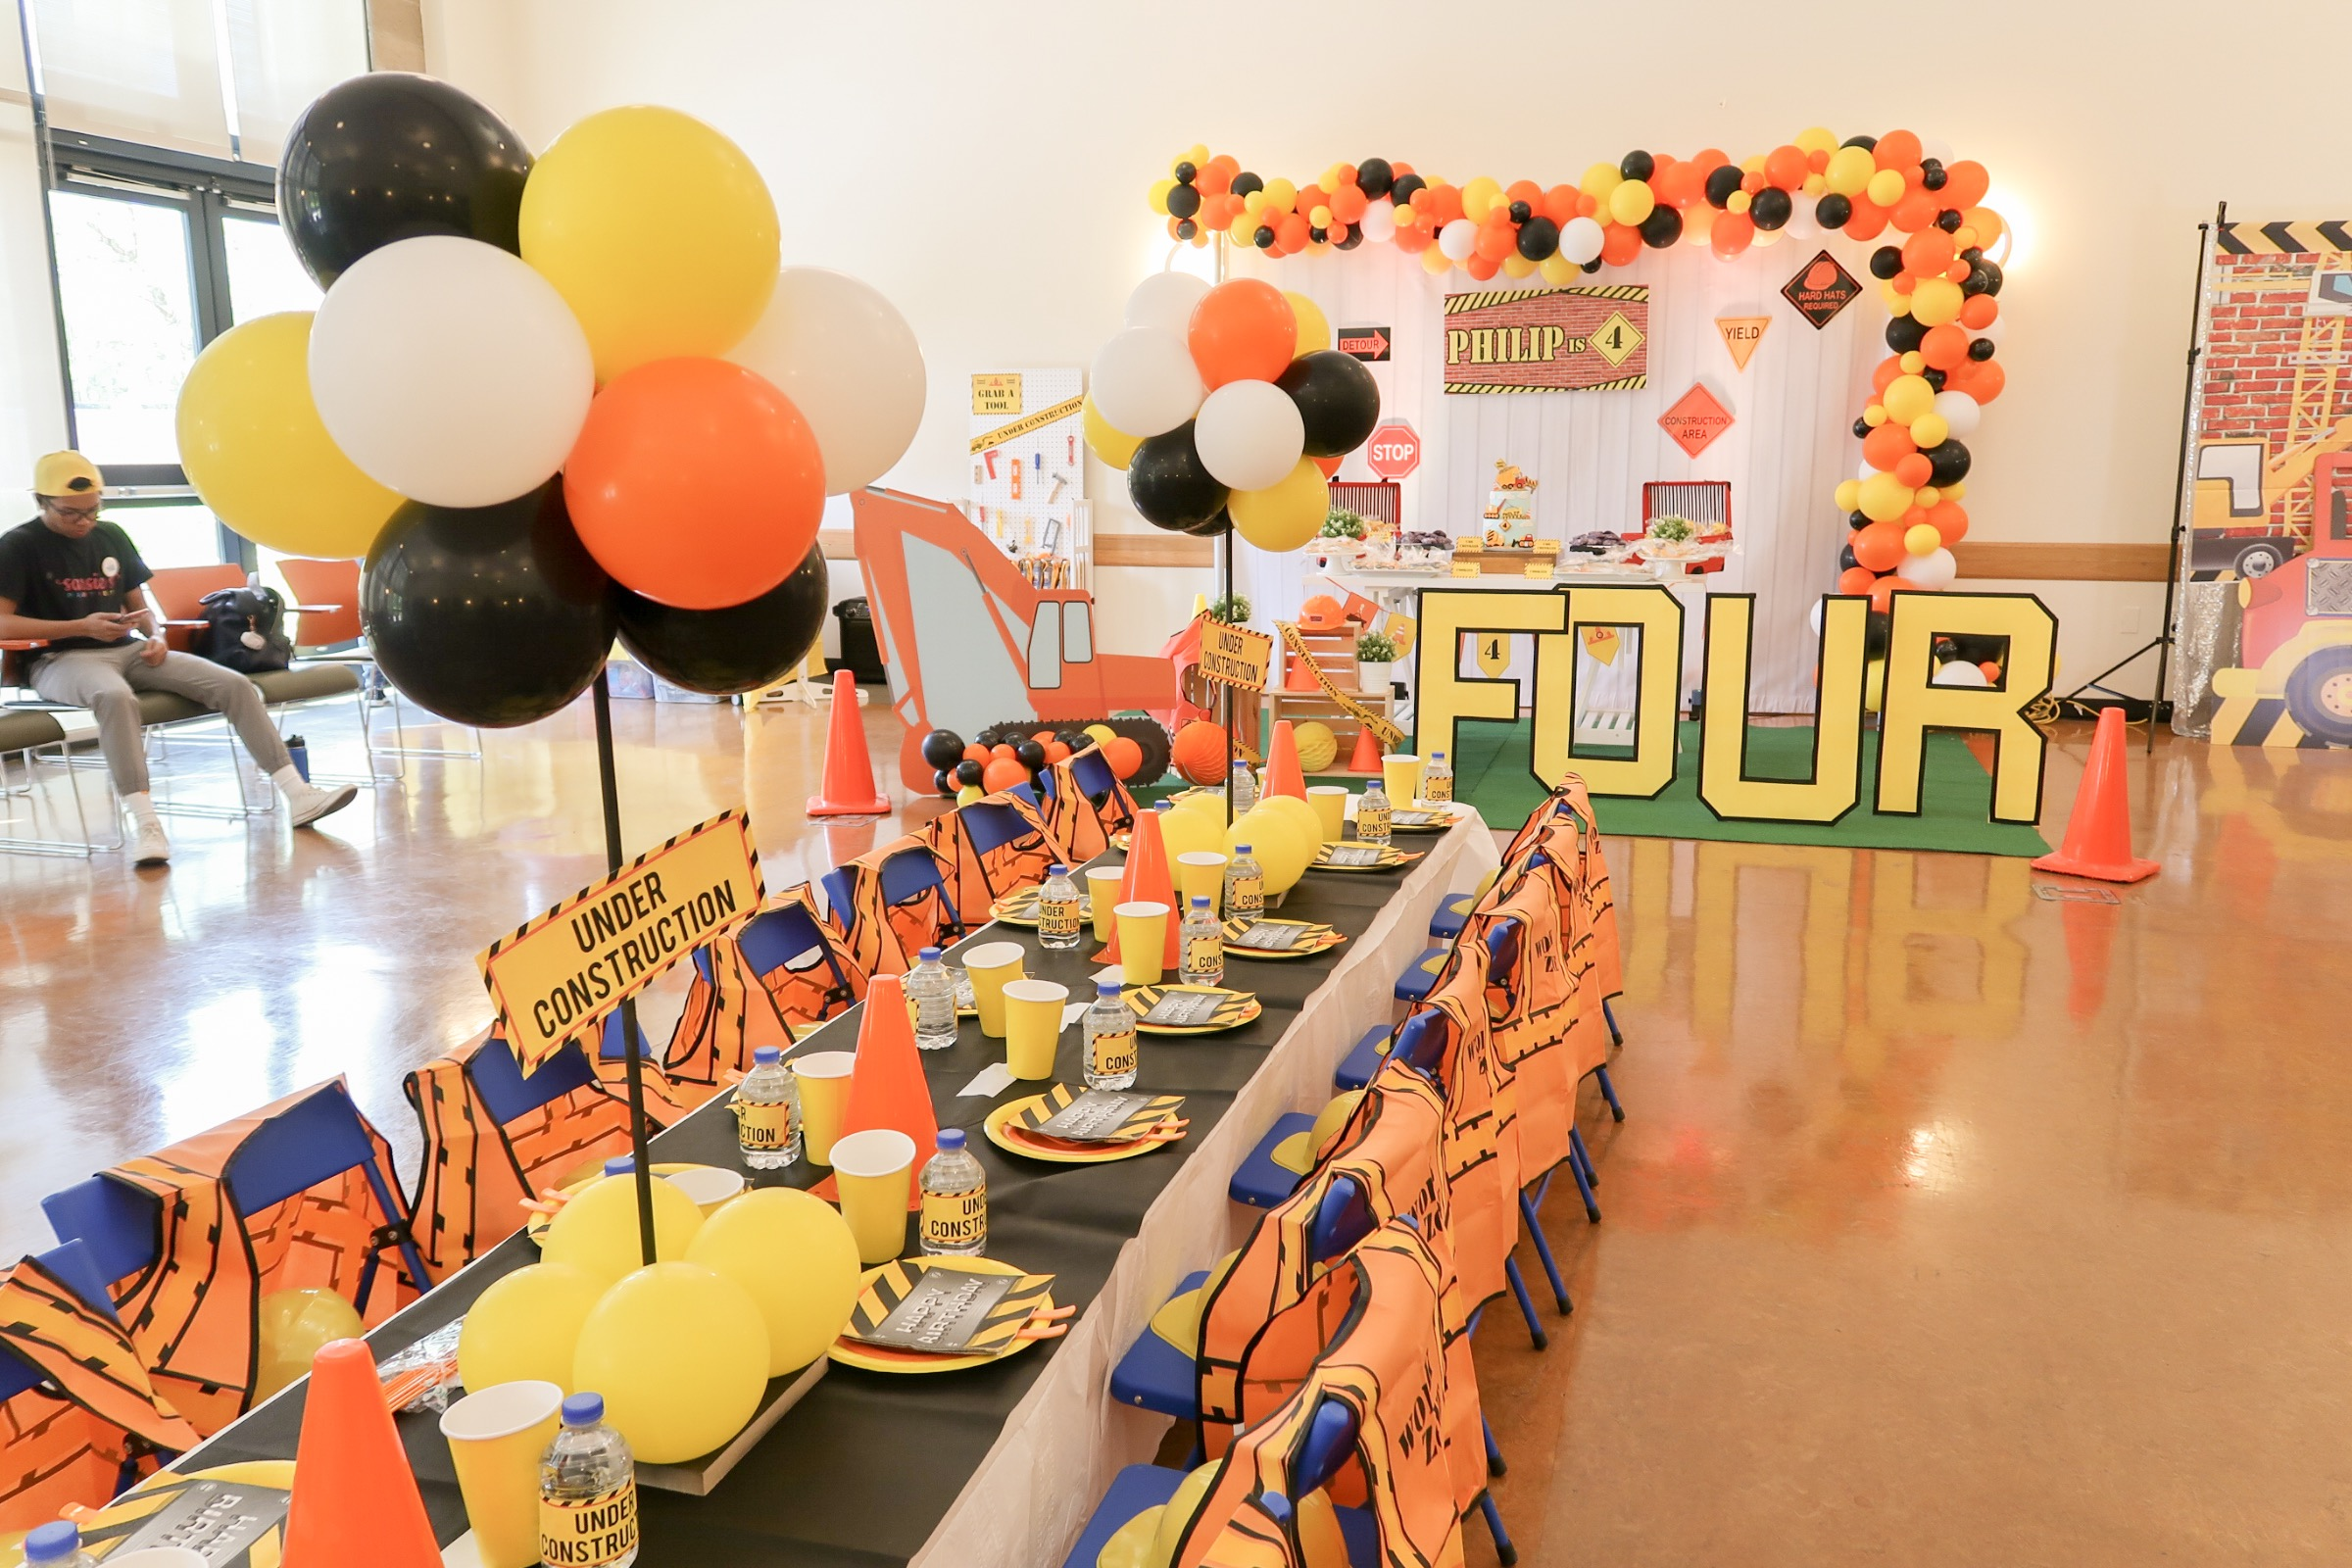 Sarsie's Parties 06-09-19 Construction Birthday Party